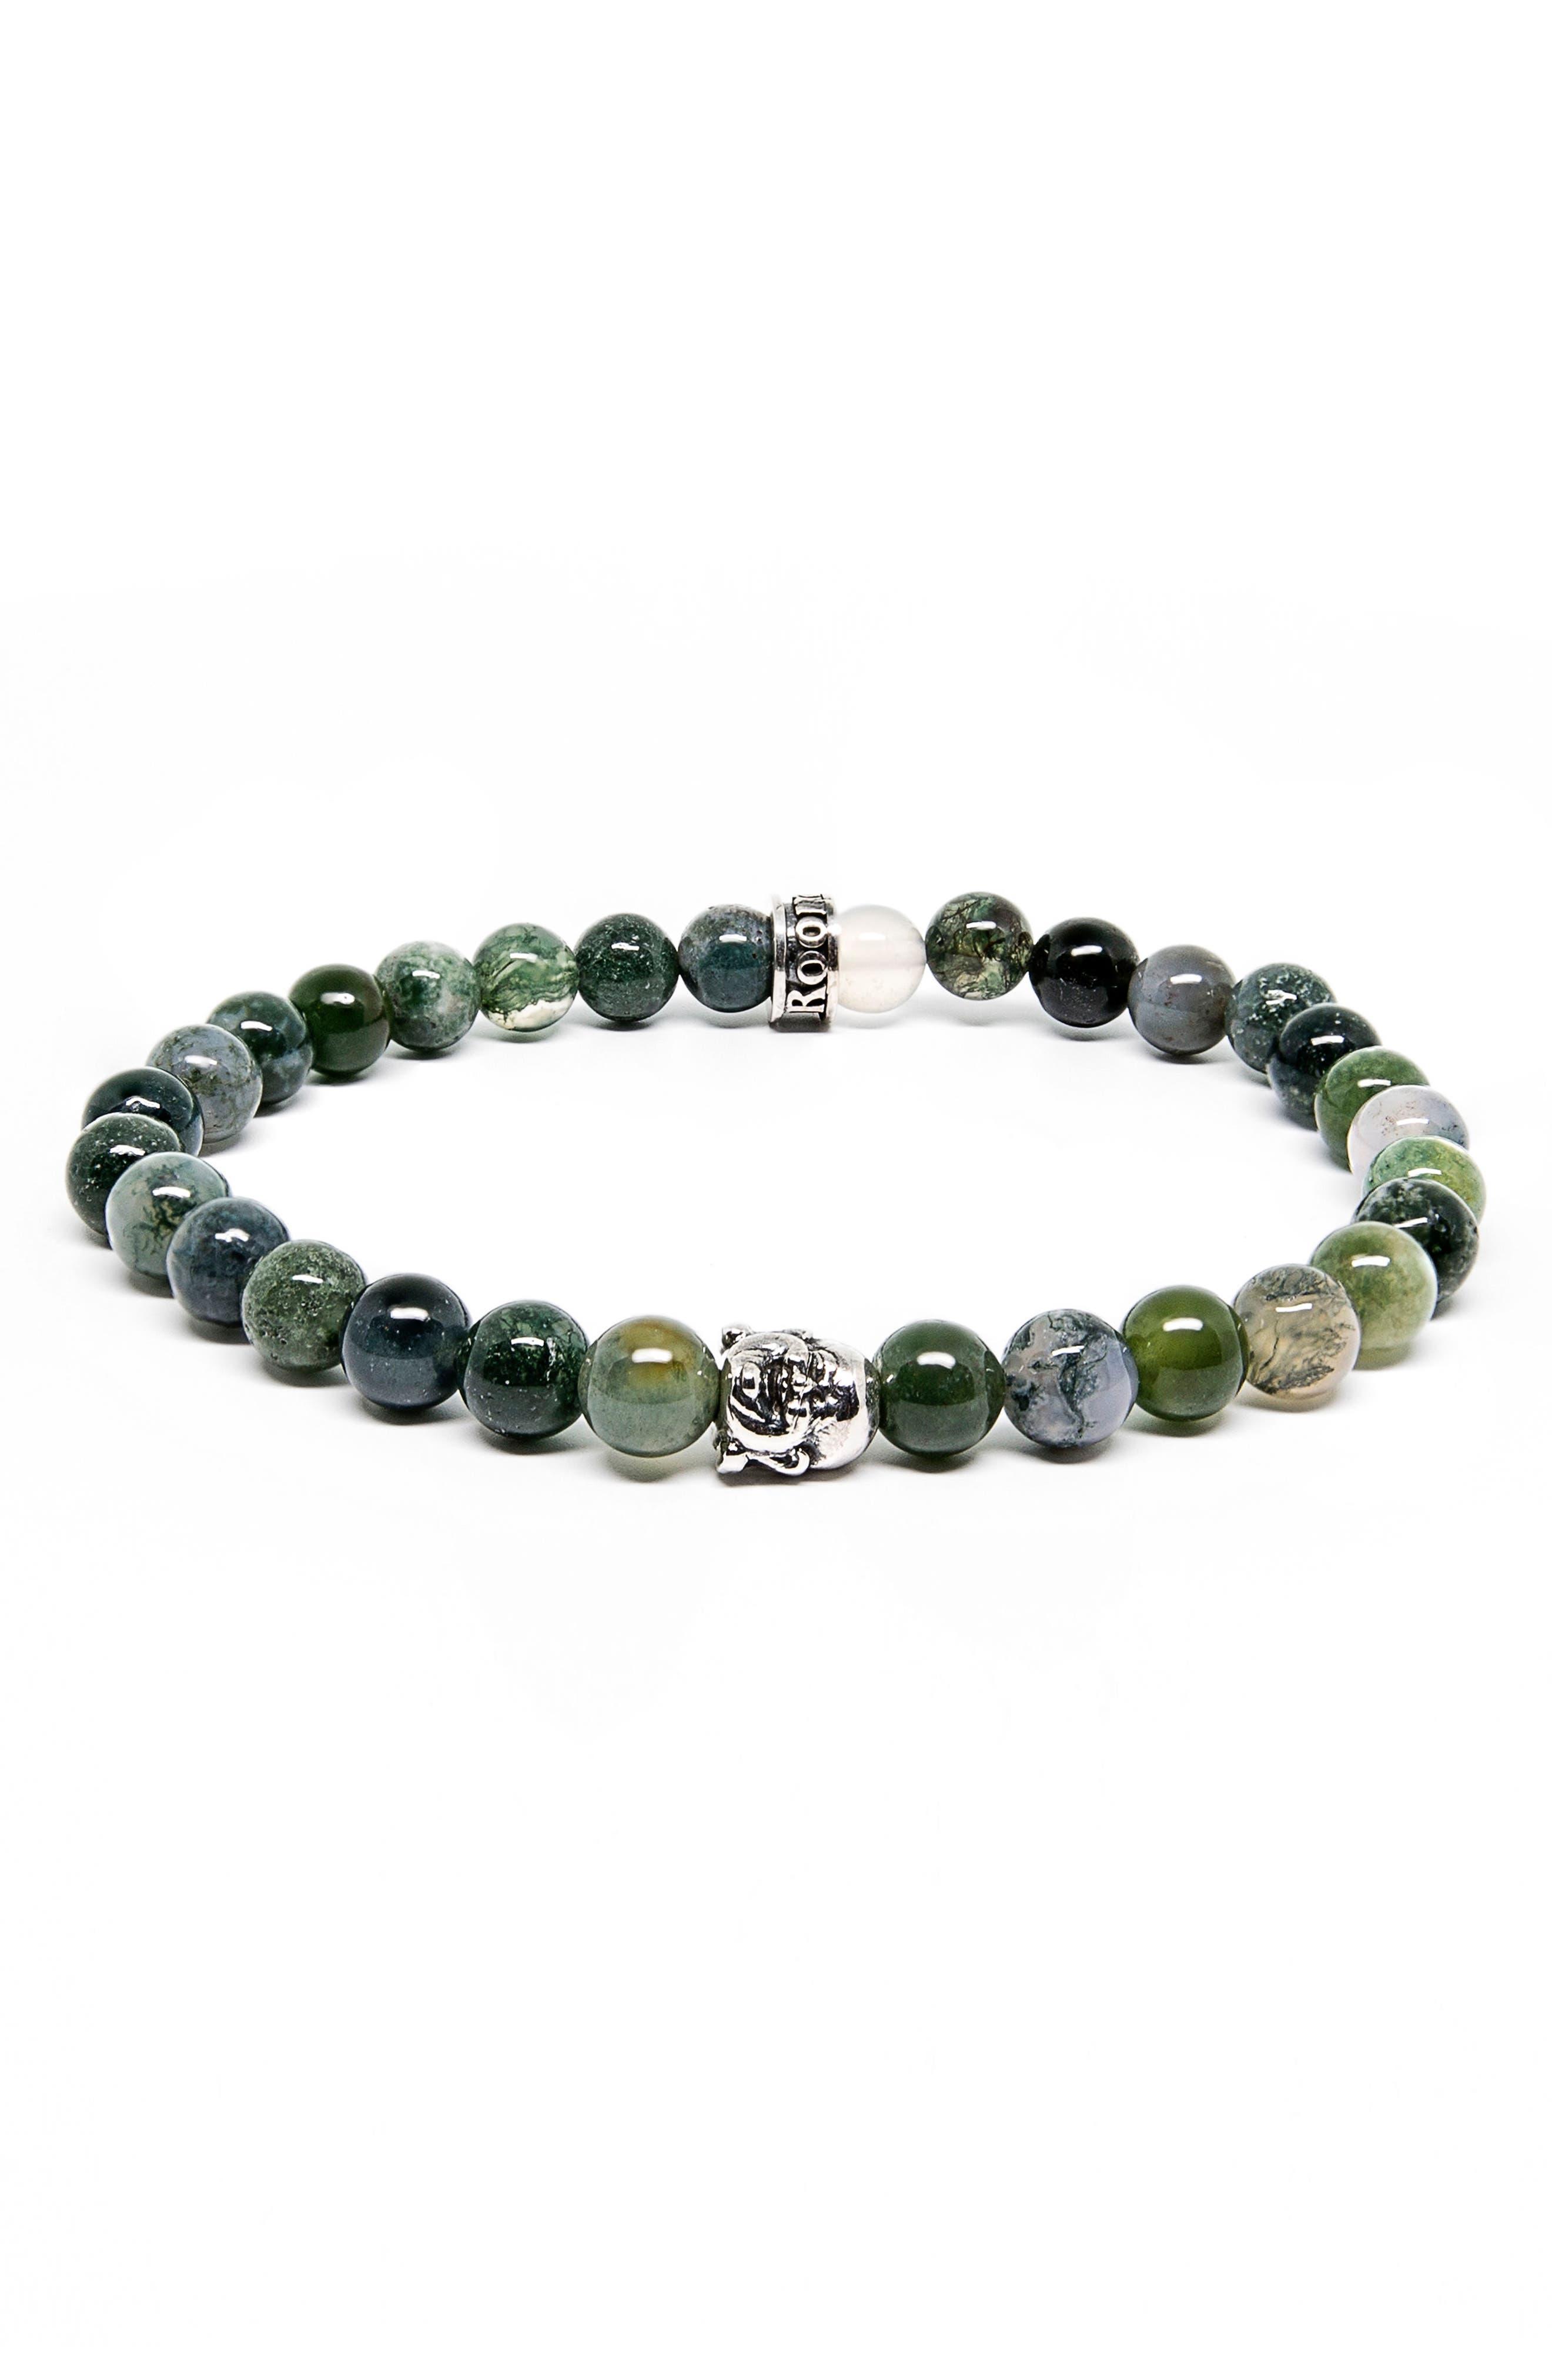 Main Image - Room101 Moss Agate Buddha Stretch Bracelet